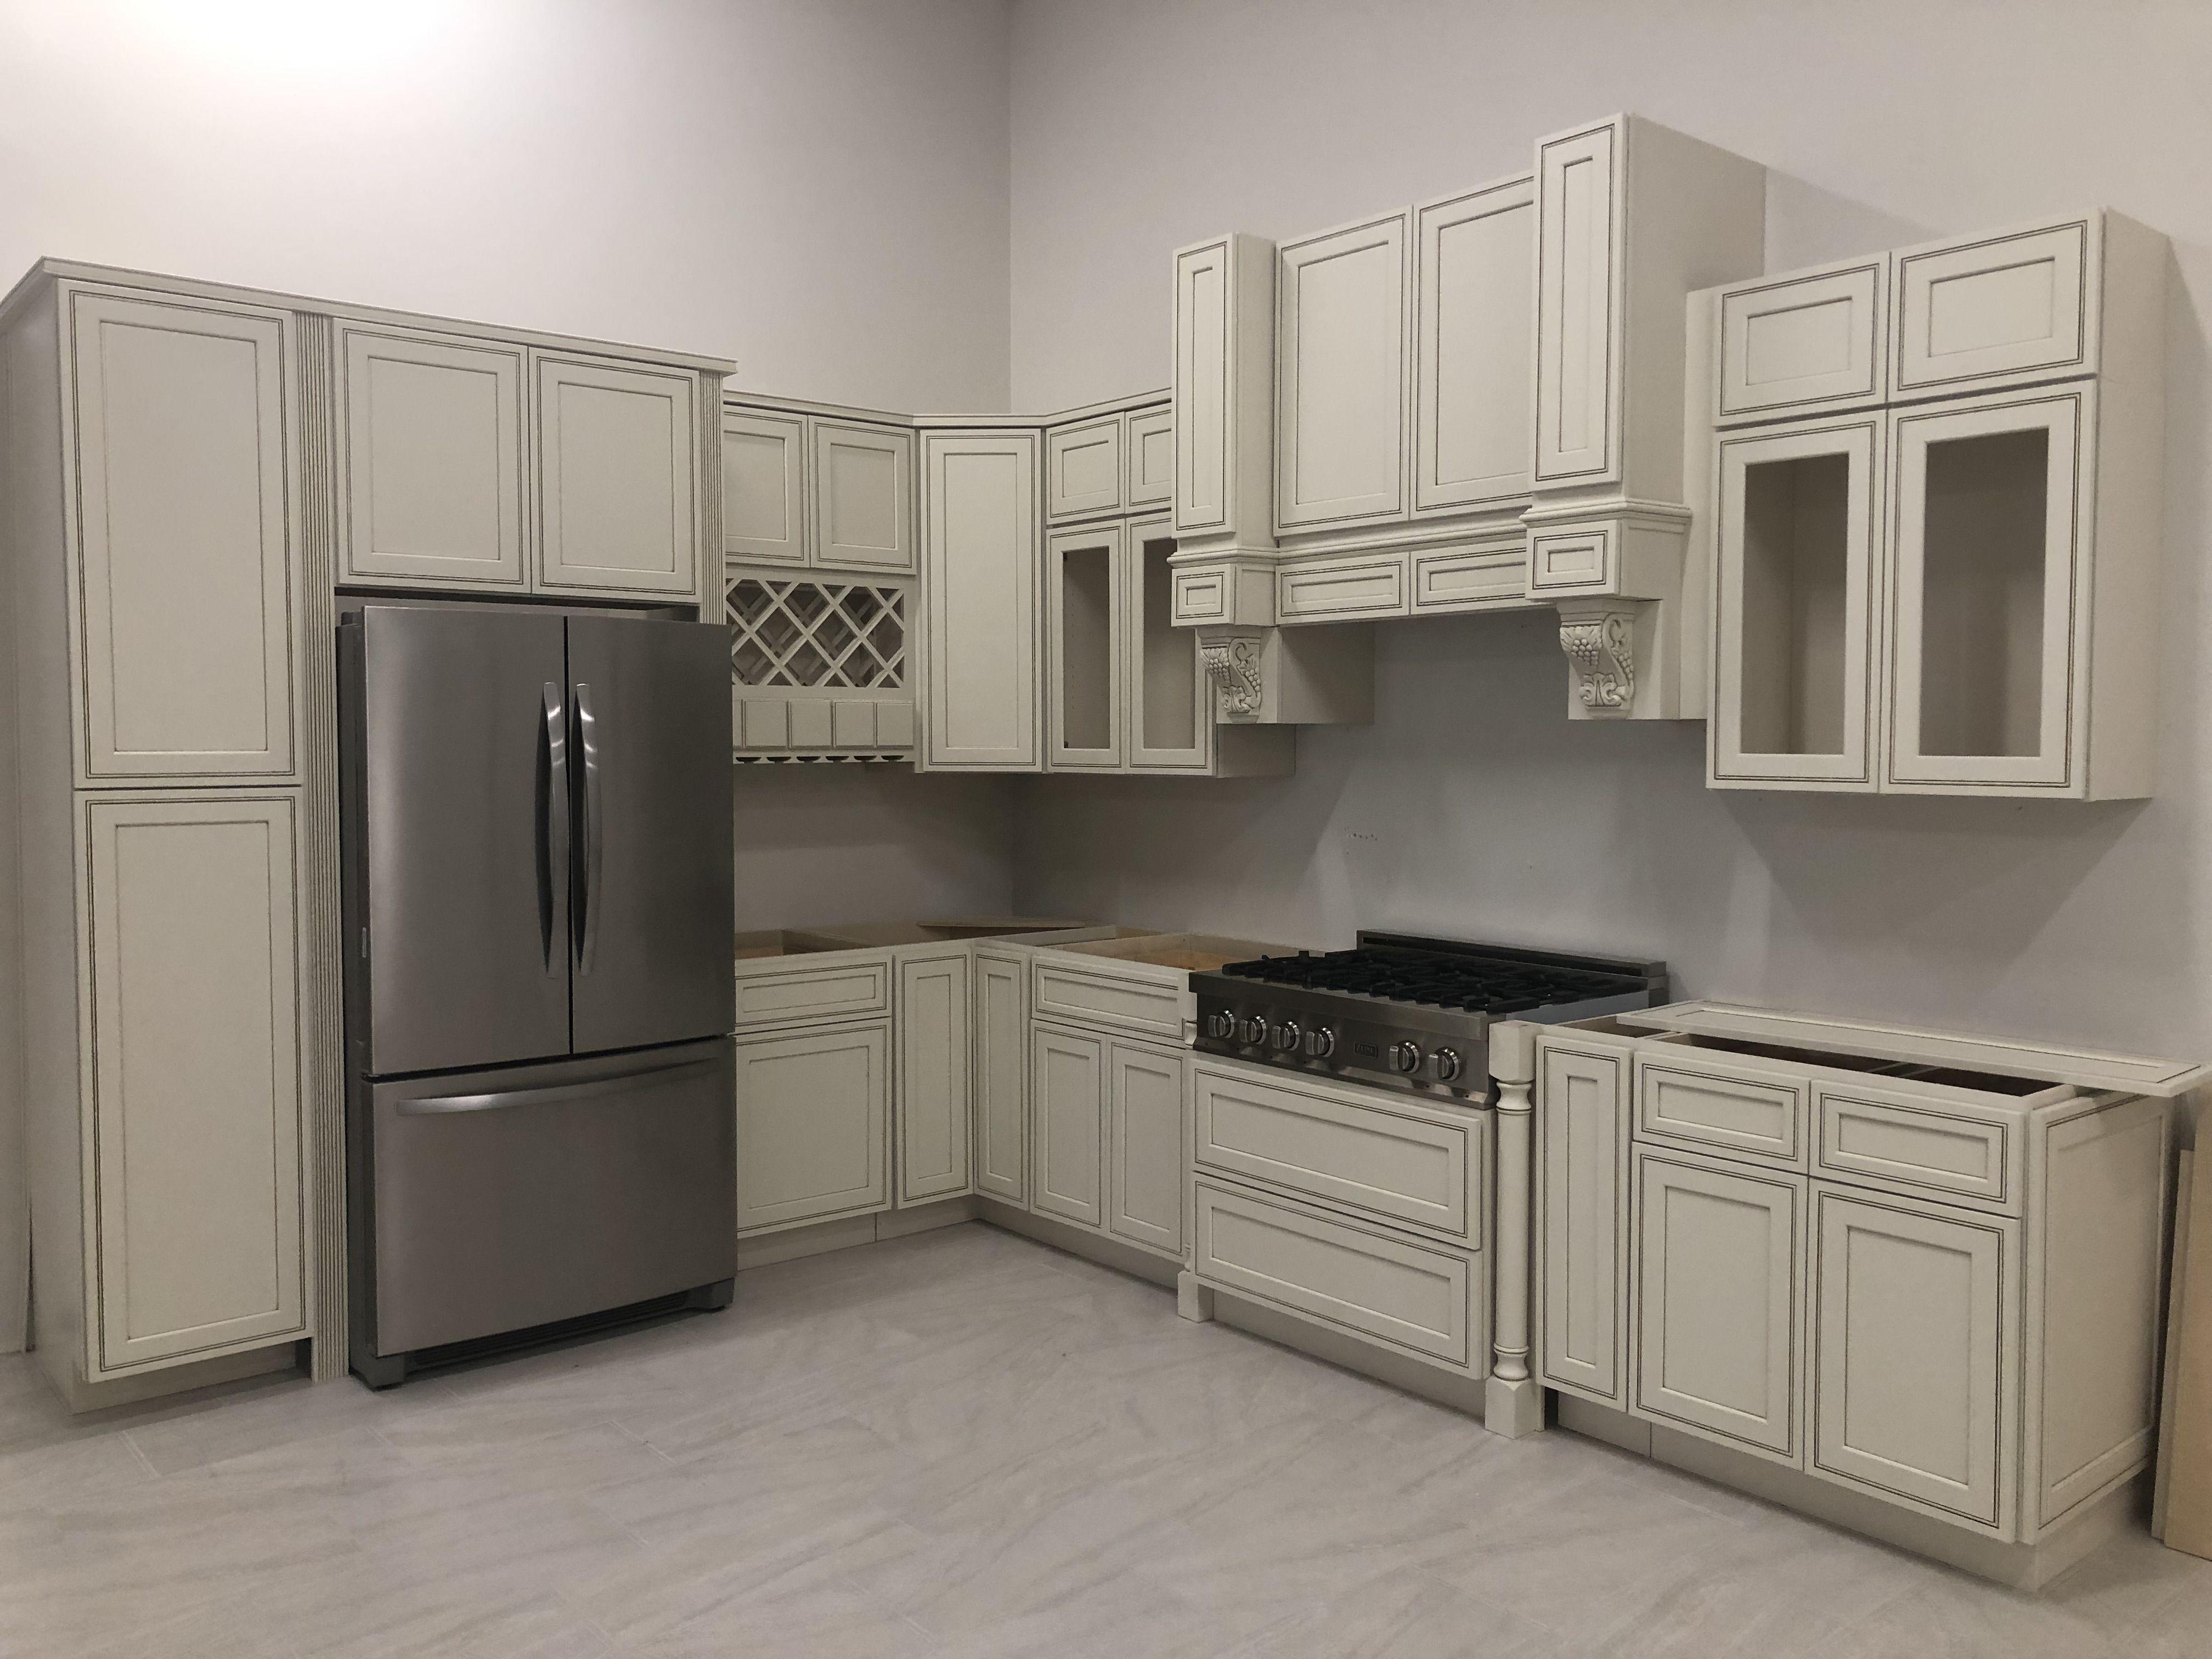 J K Cabintery Cabintery Home Decor Kitchen Cabinets